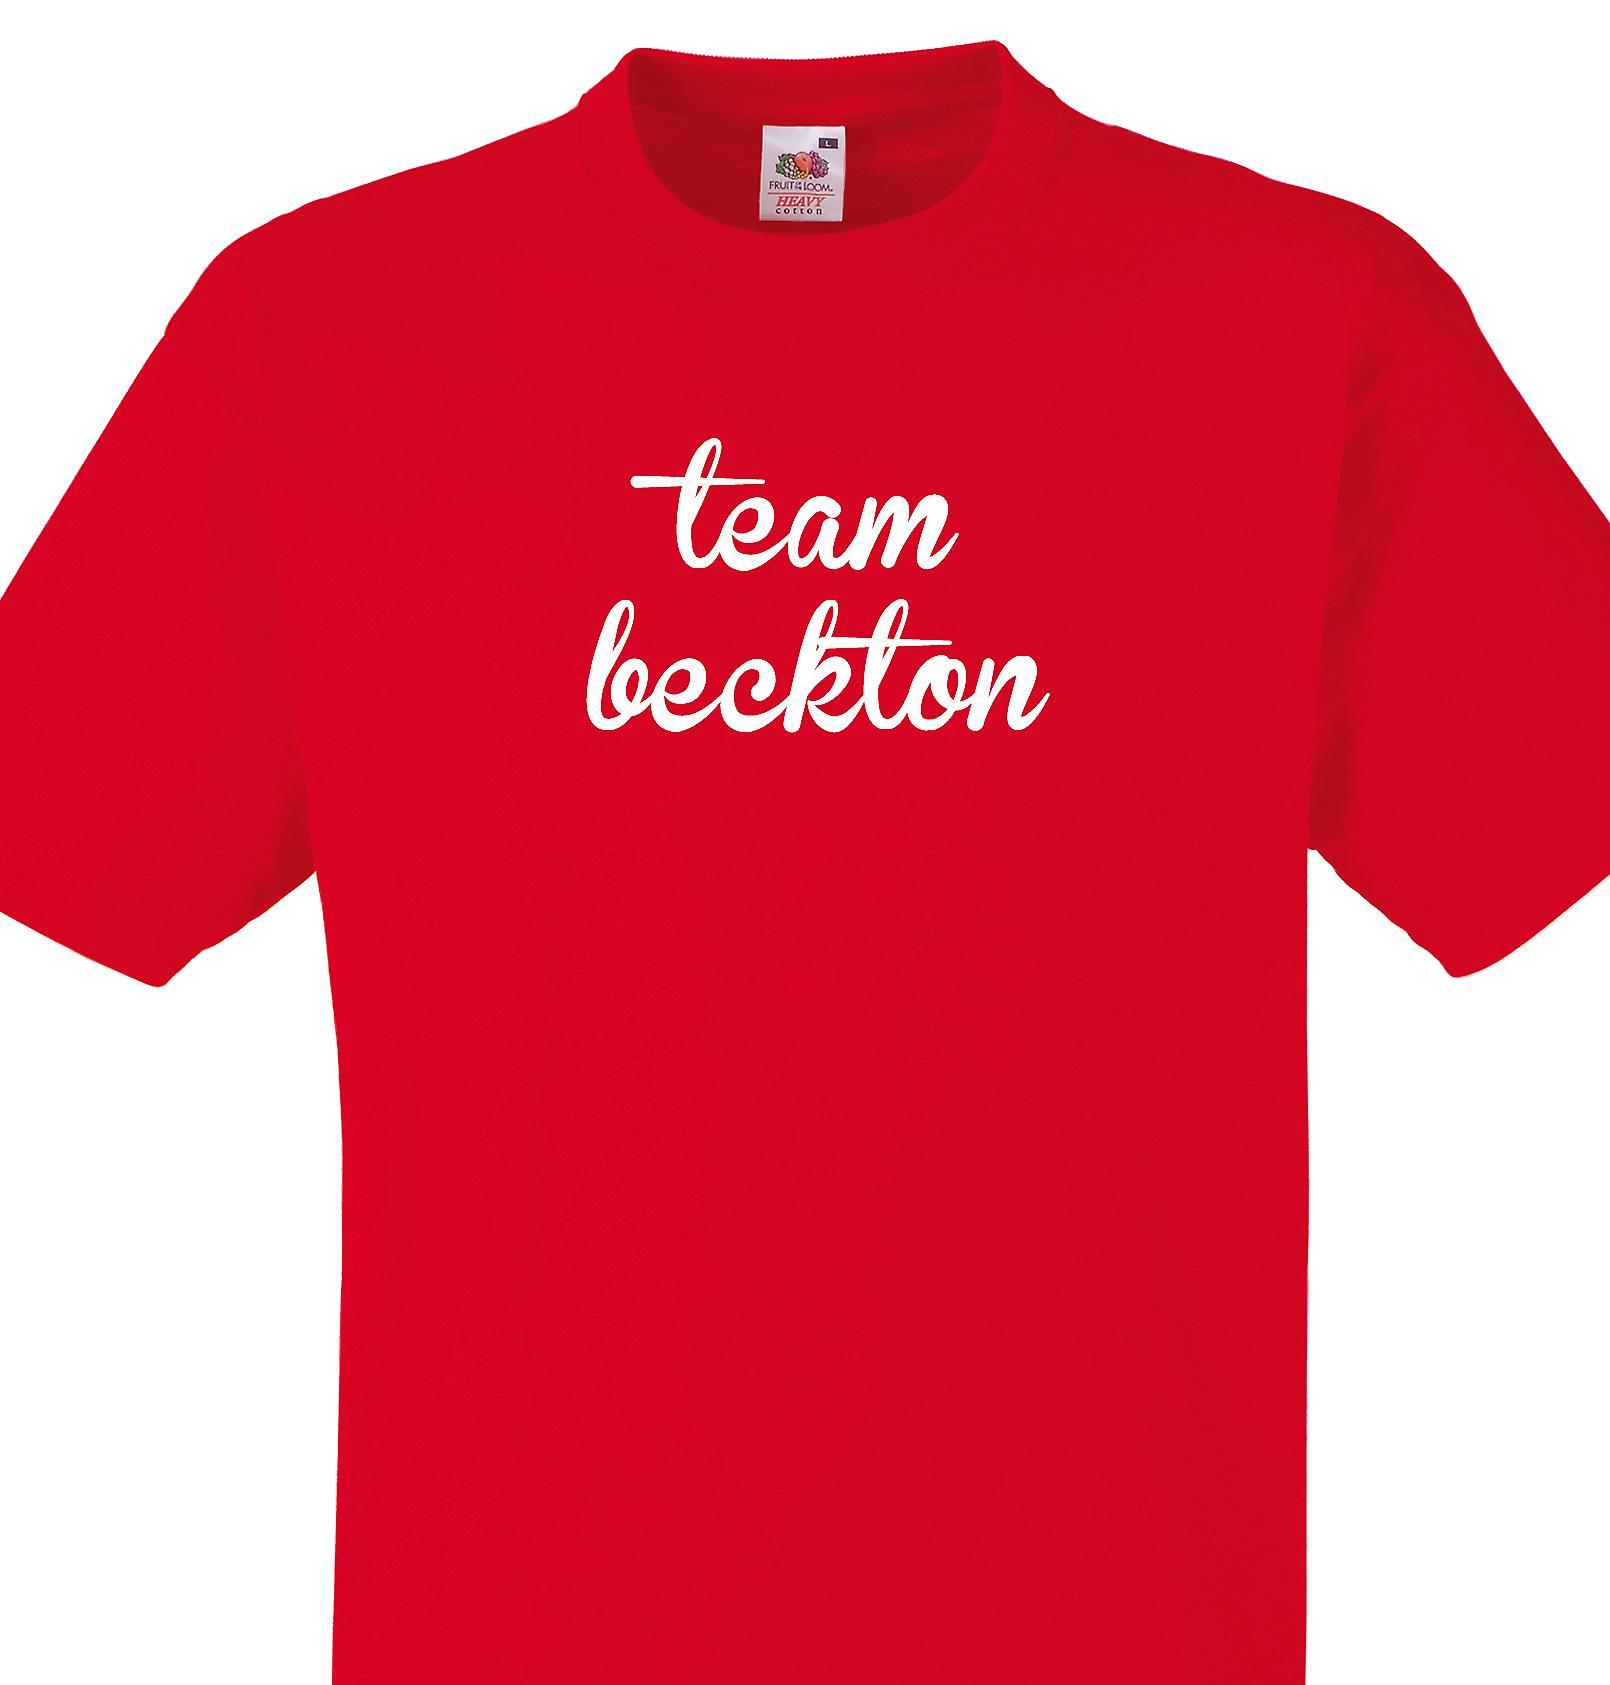 Team Beckton Red T shirt